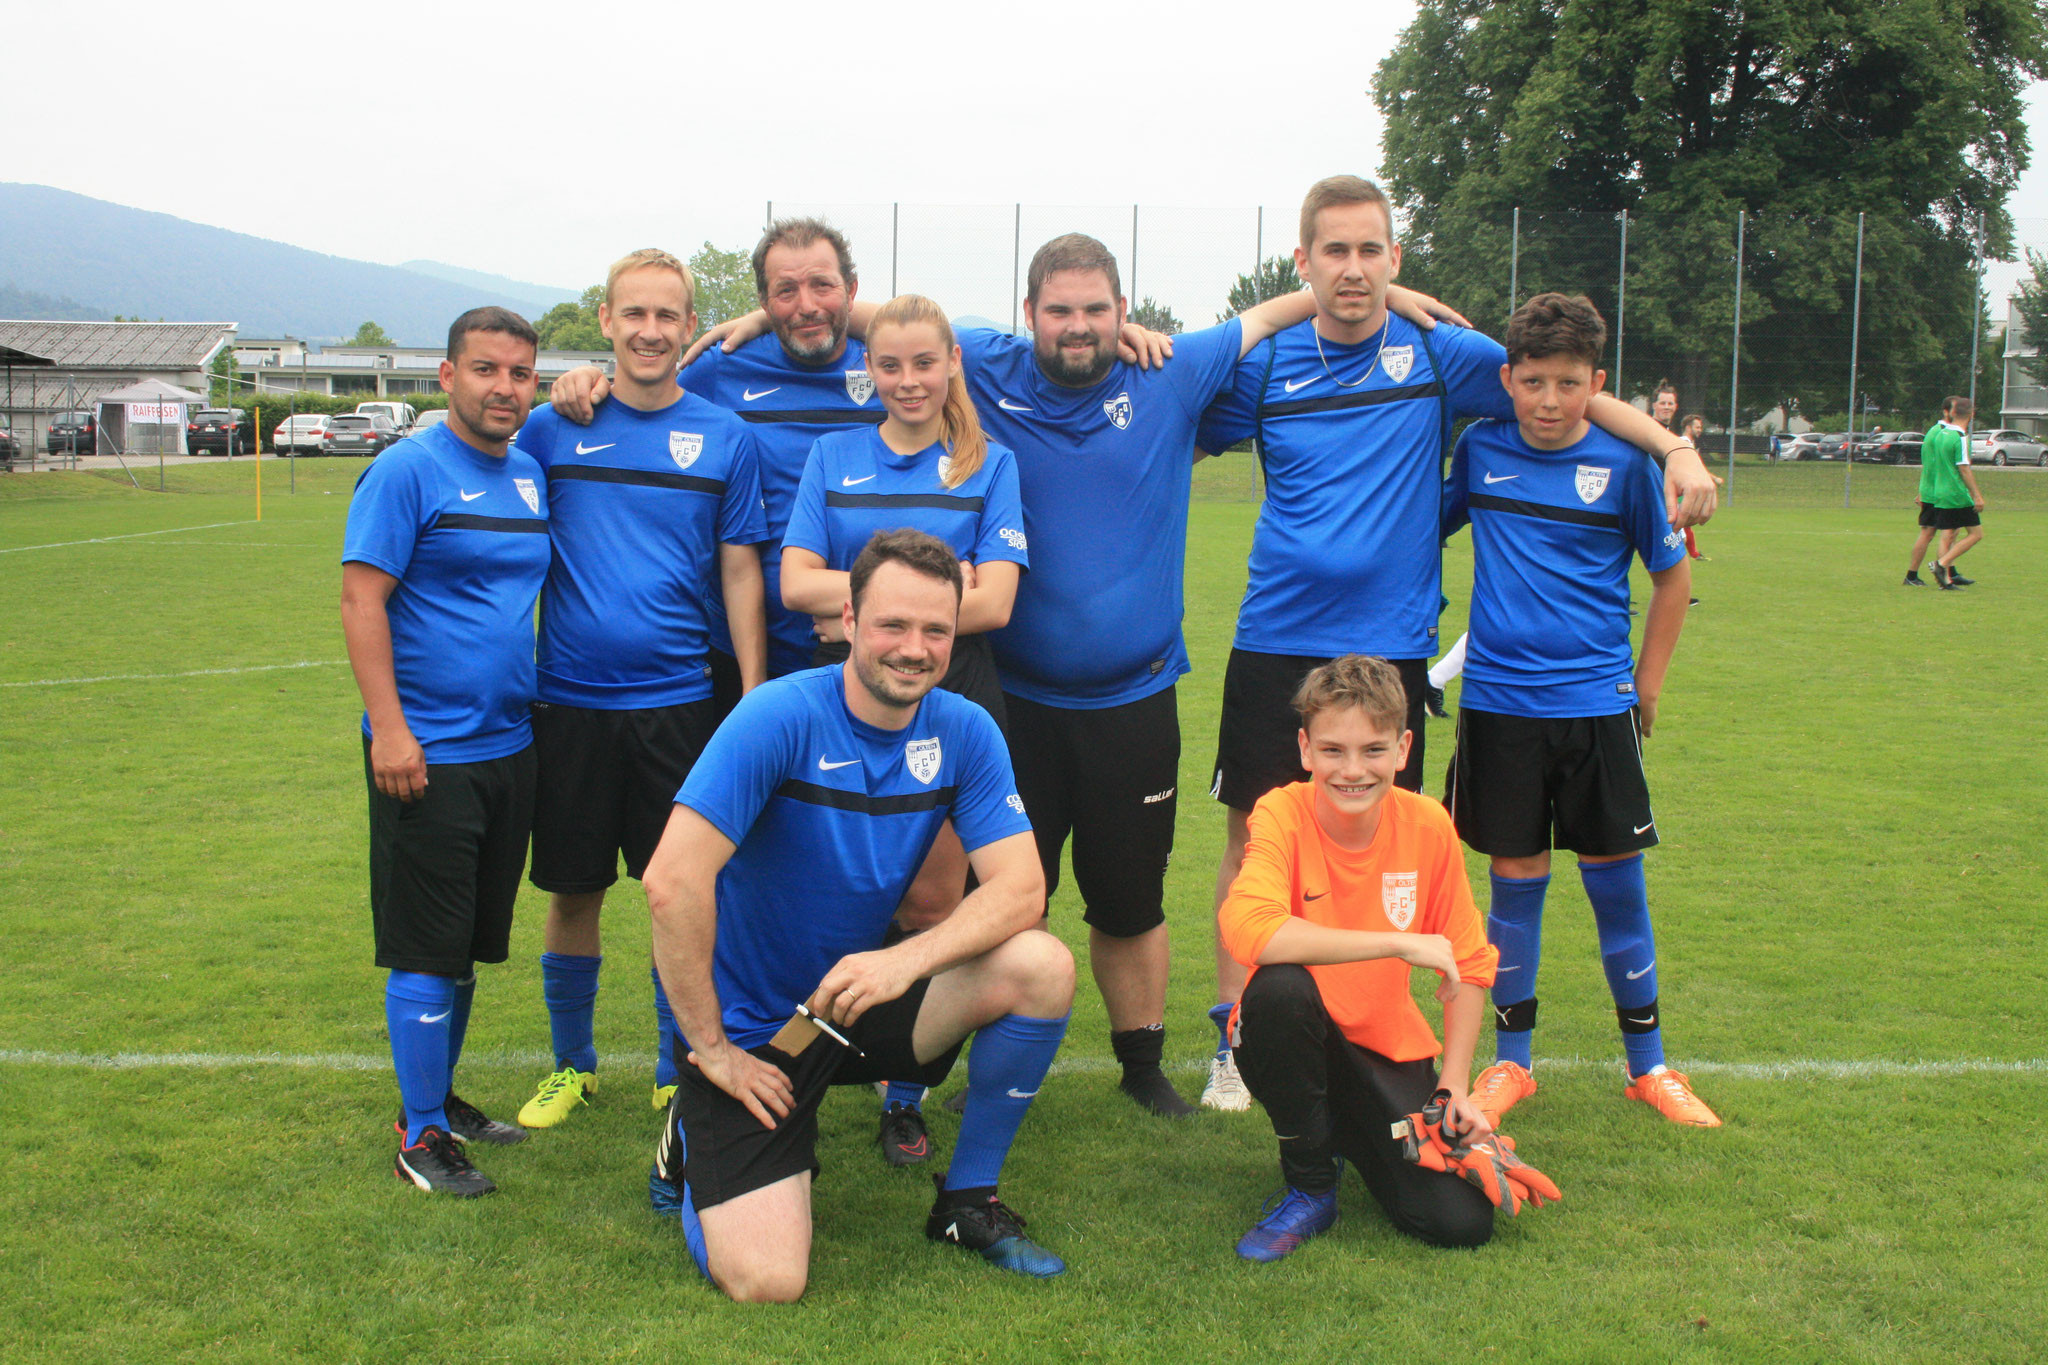 FC Olten Junioren Trainer